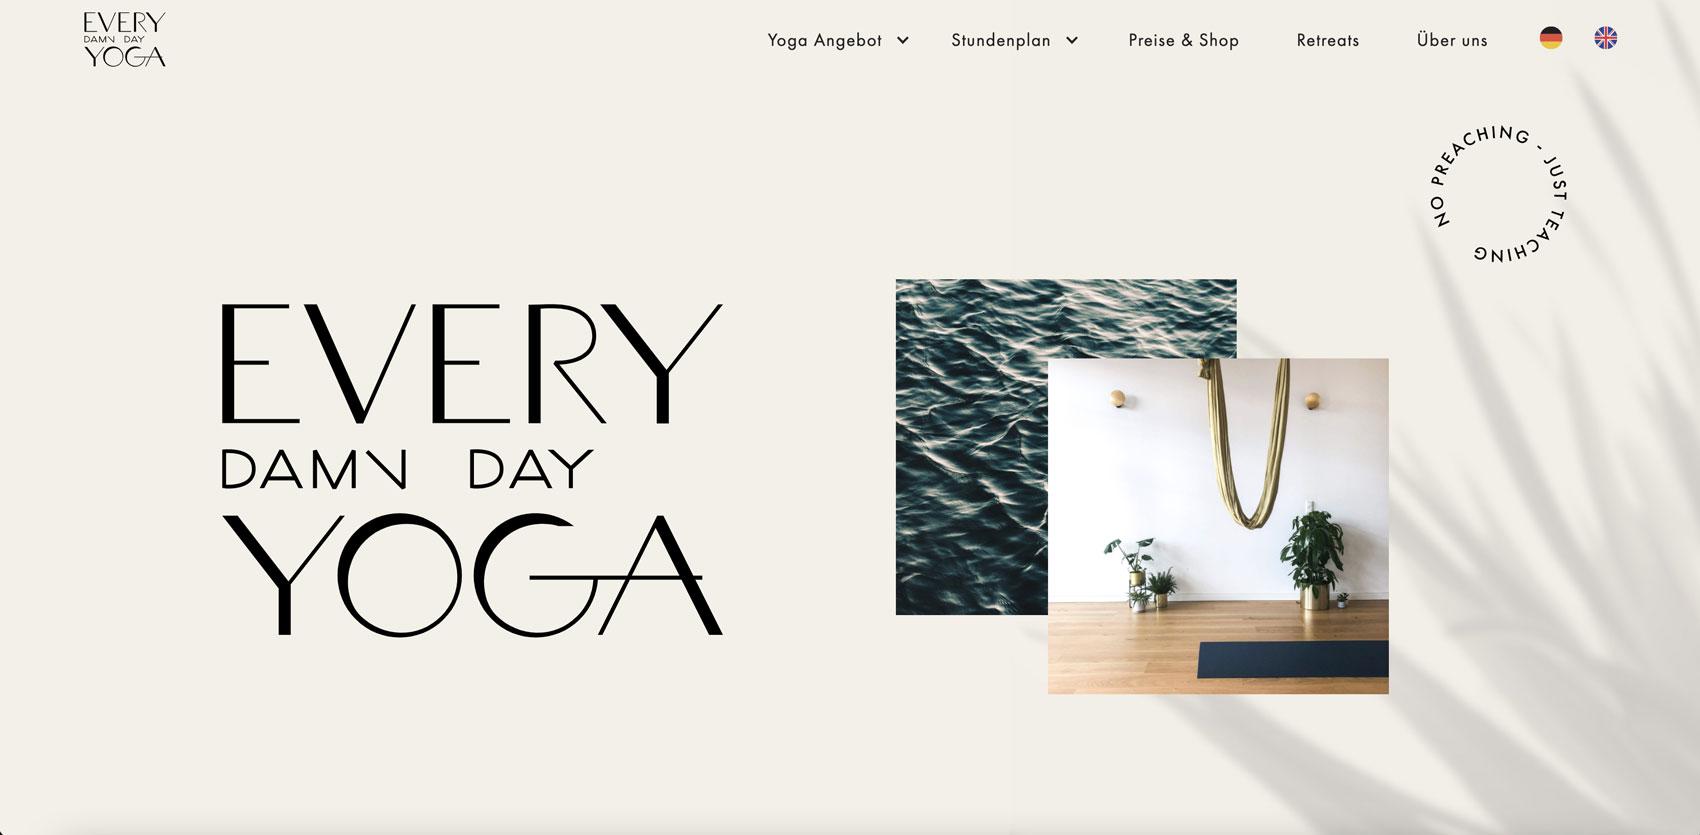 Website design by Alexandra Linortner for the yoga studio Every damn day Yoga in Berlin